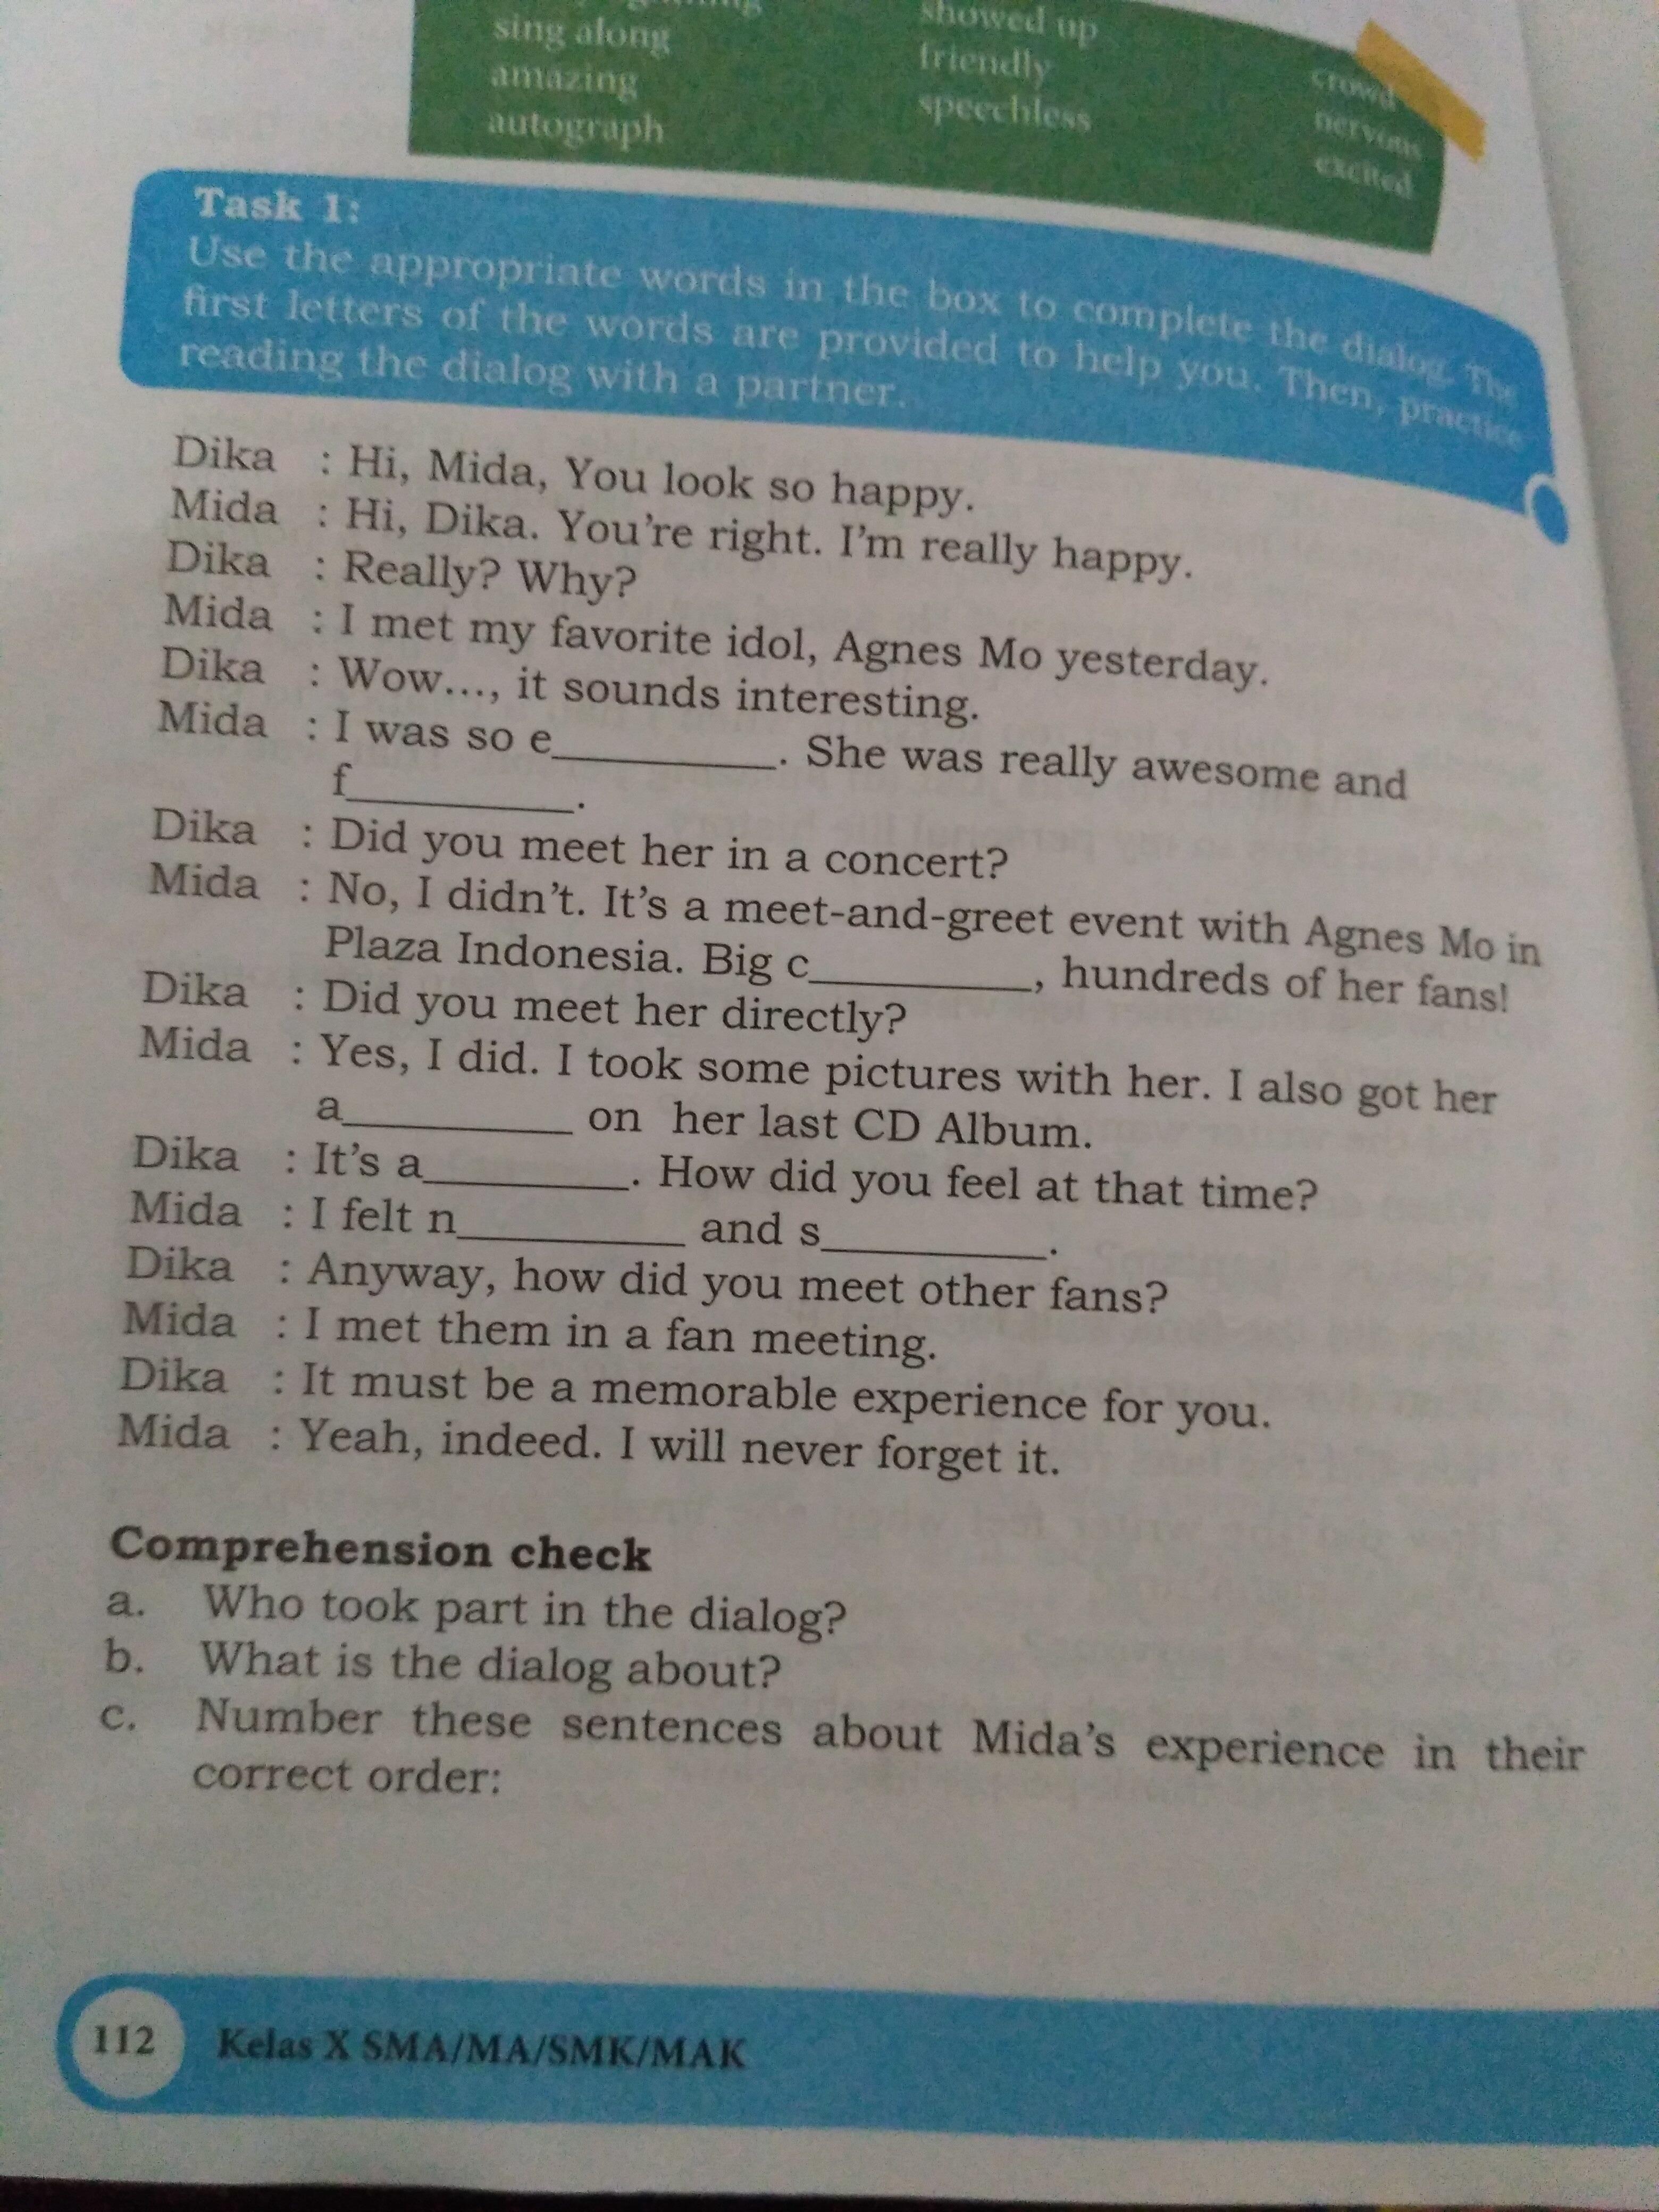 Contoh Dialog Dika Dan Mida Brainly Co Id